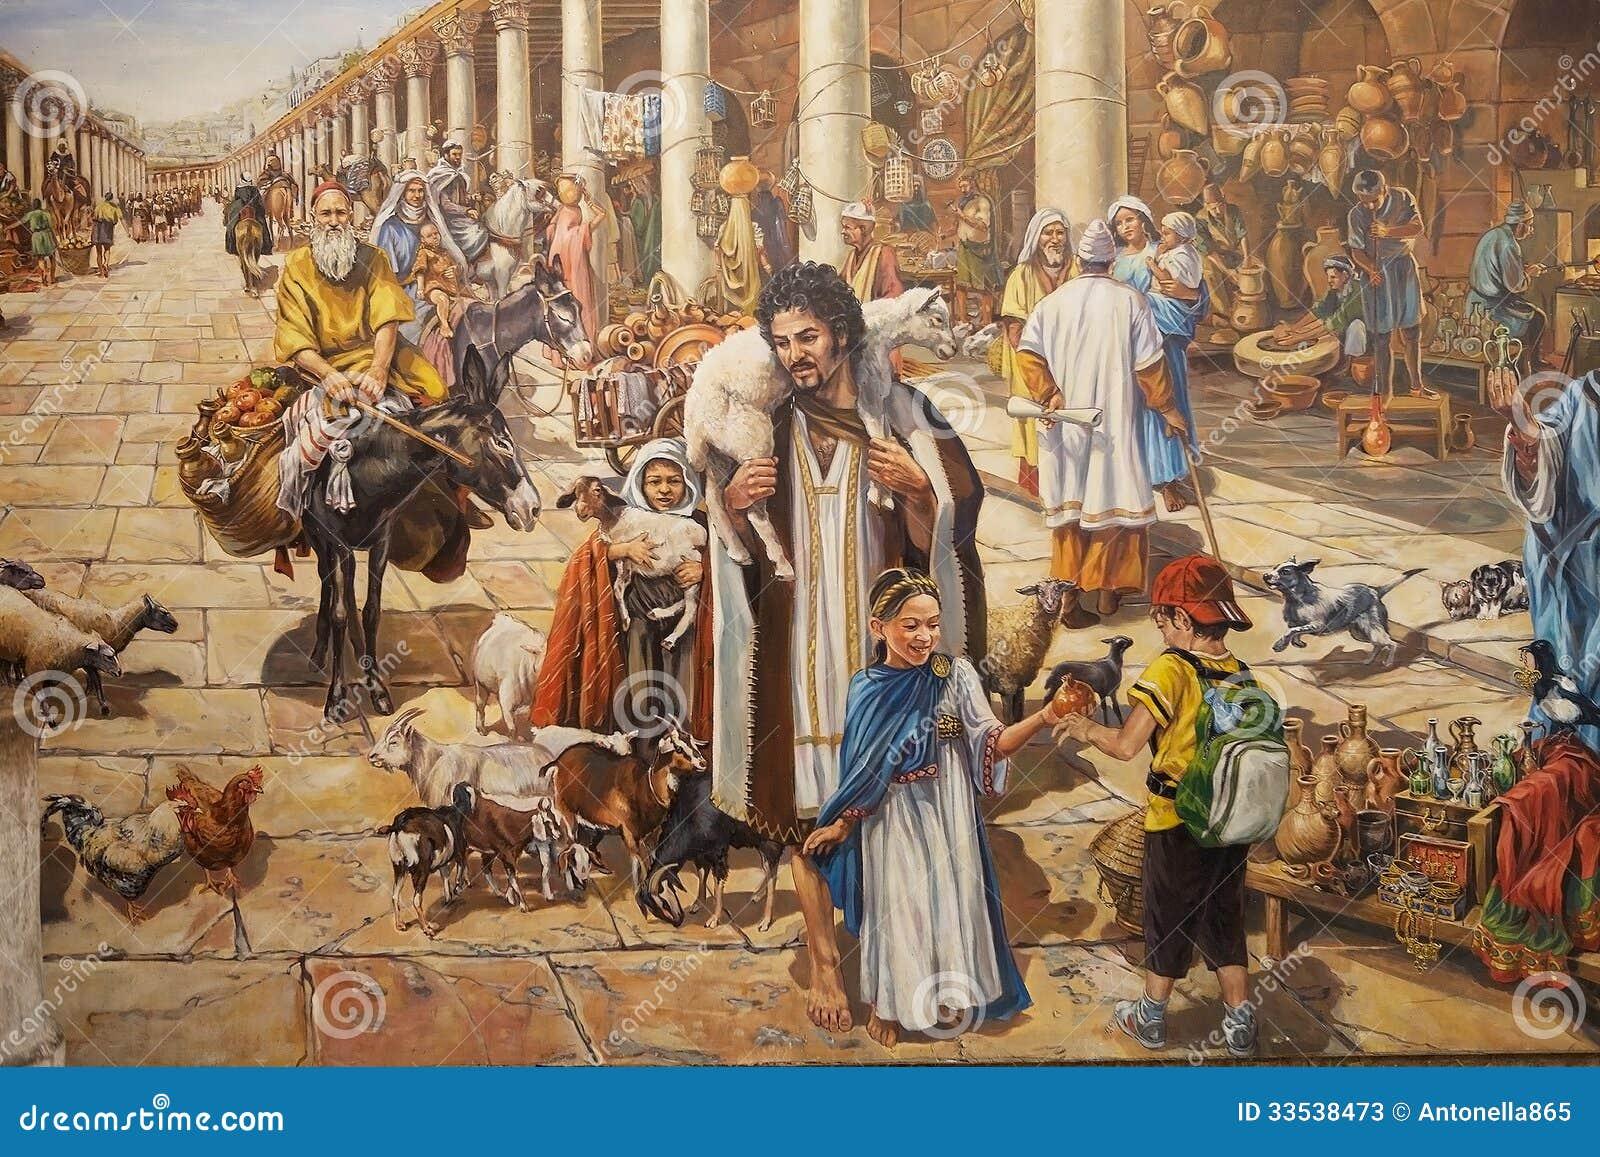 Ancient/Biblical History » Judaism